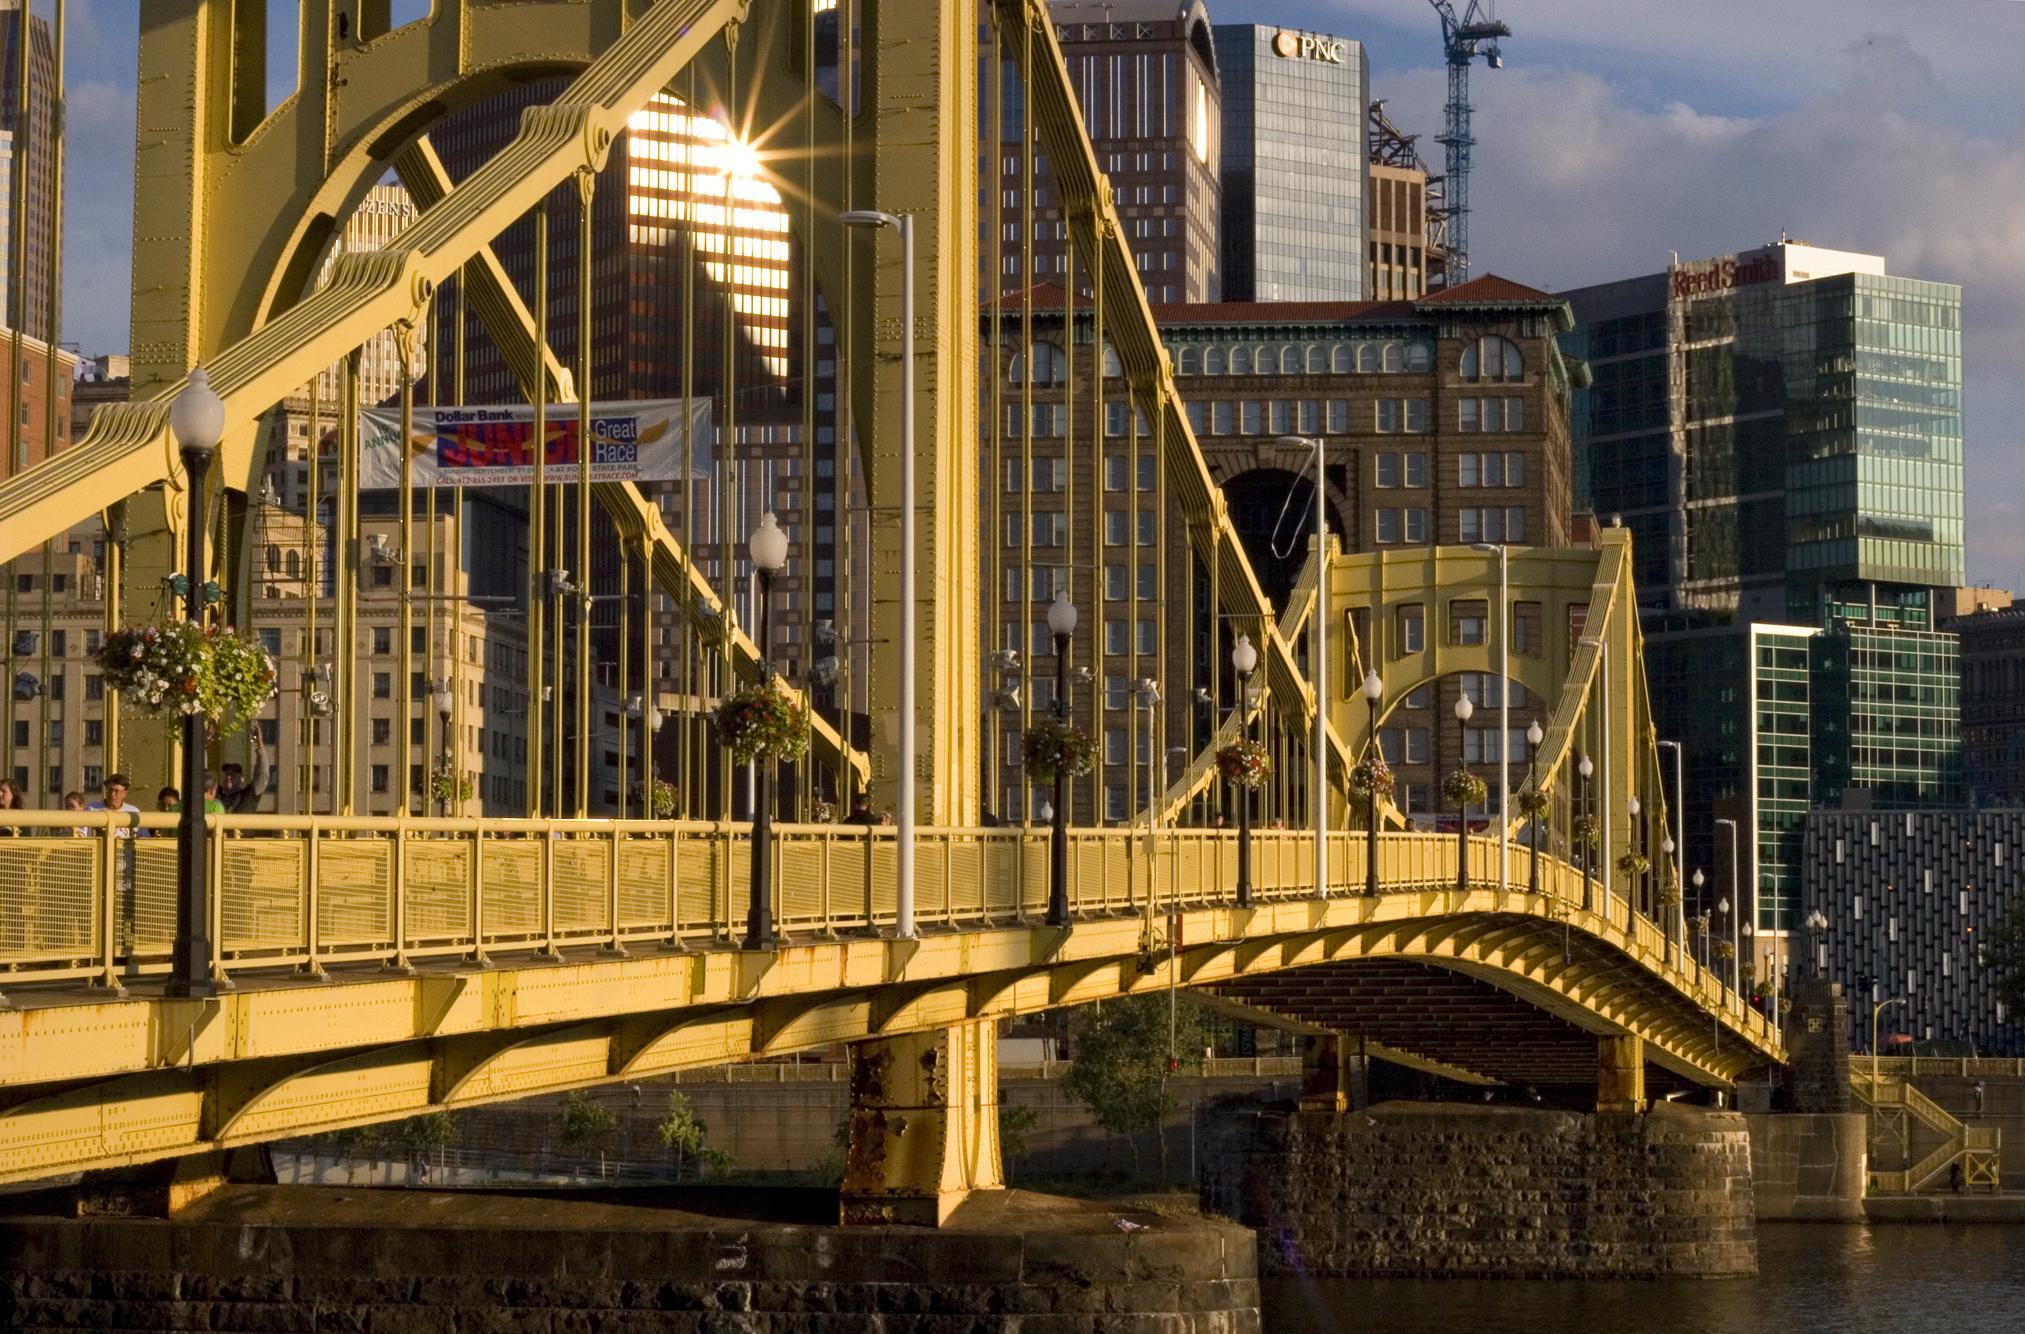 6th St Bridge